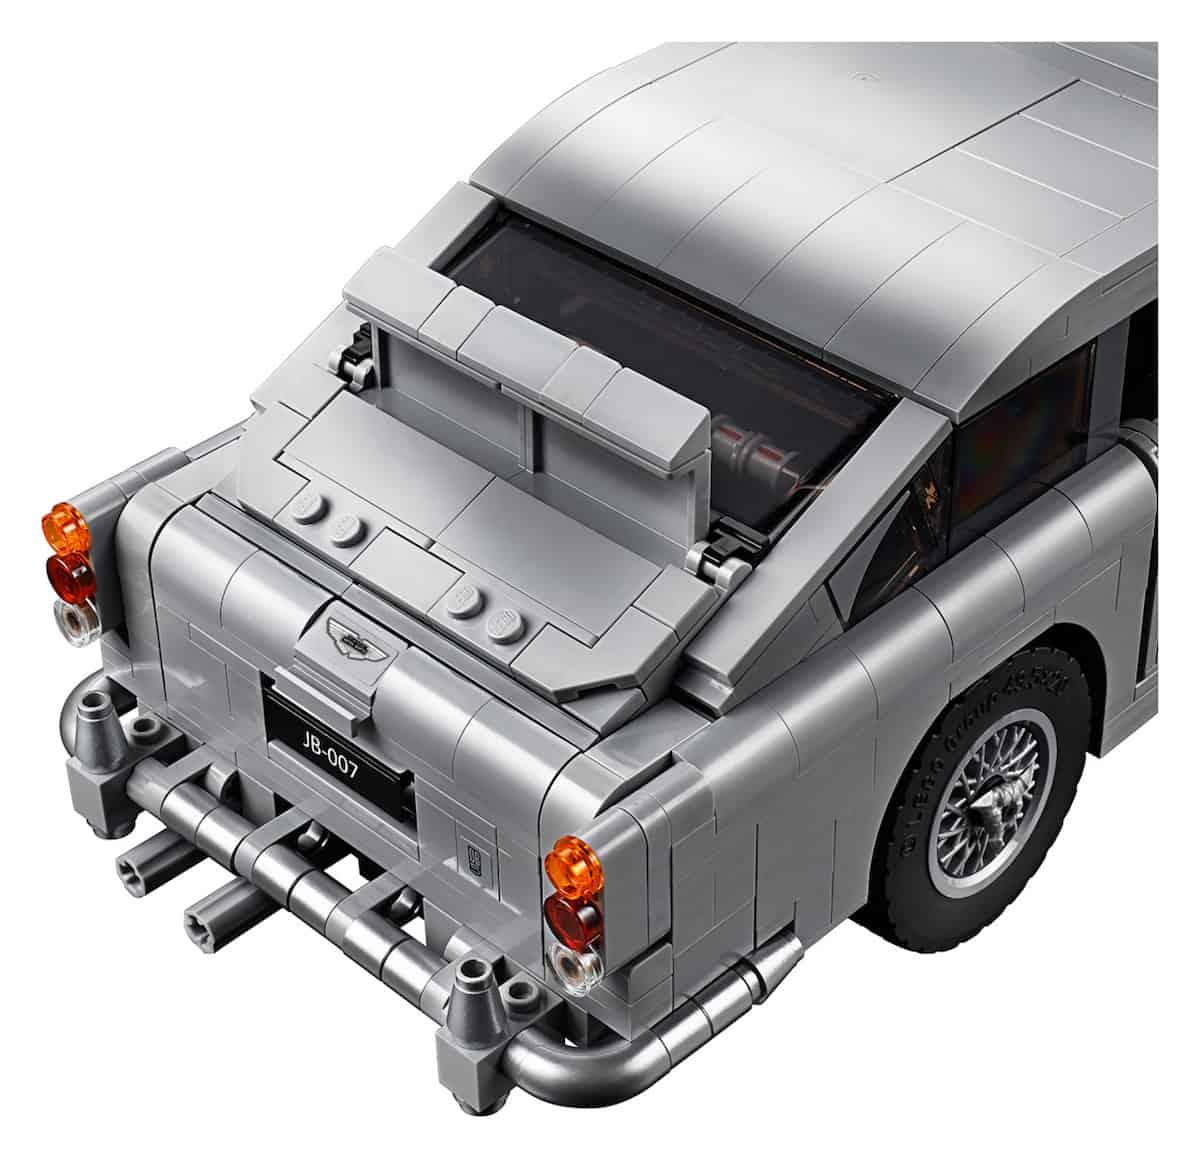 lego james bond aston martin db5 rear grill